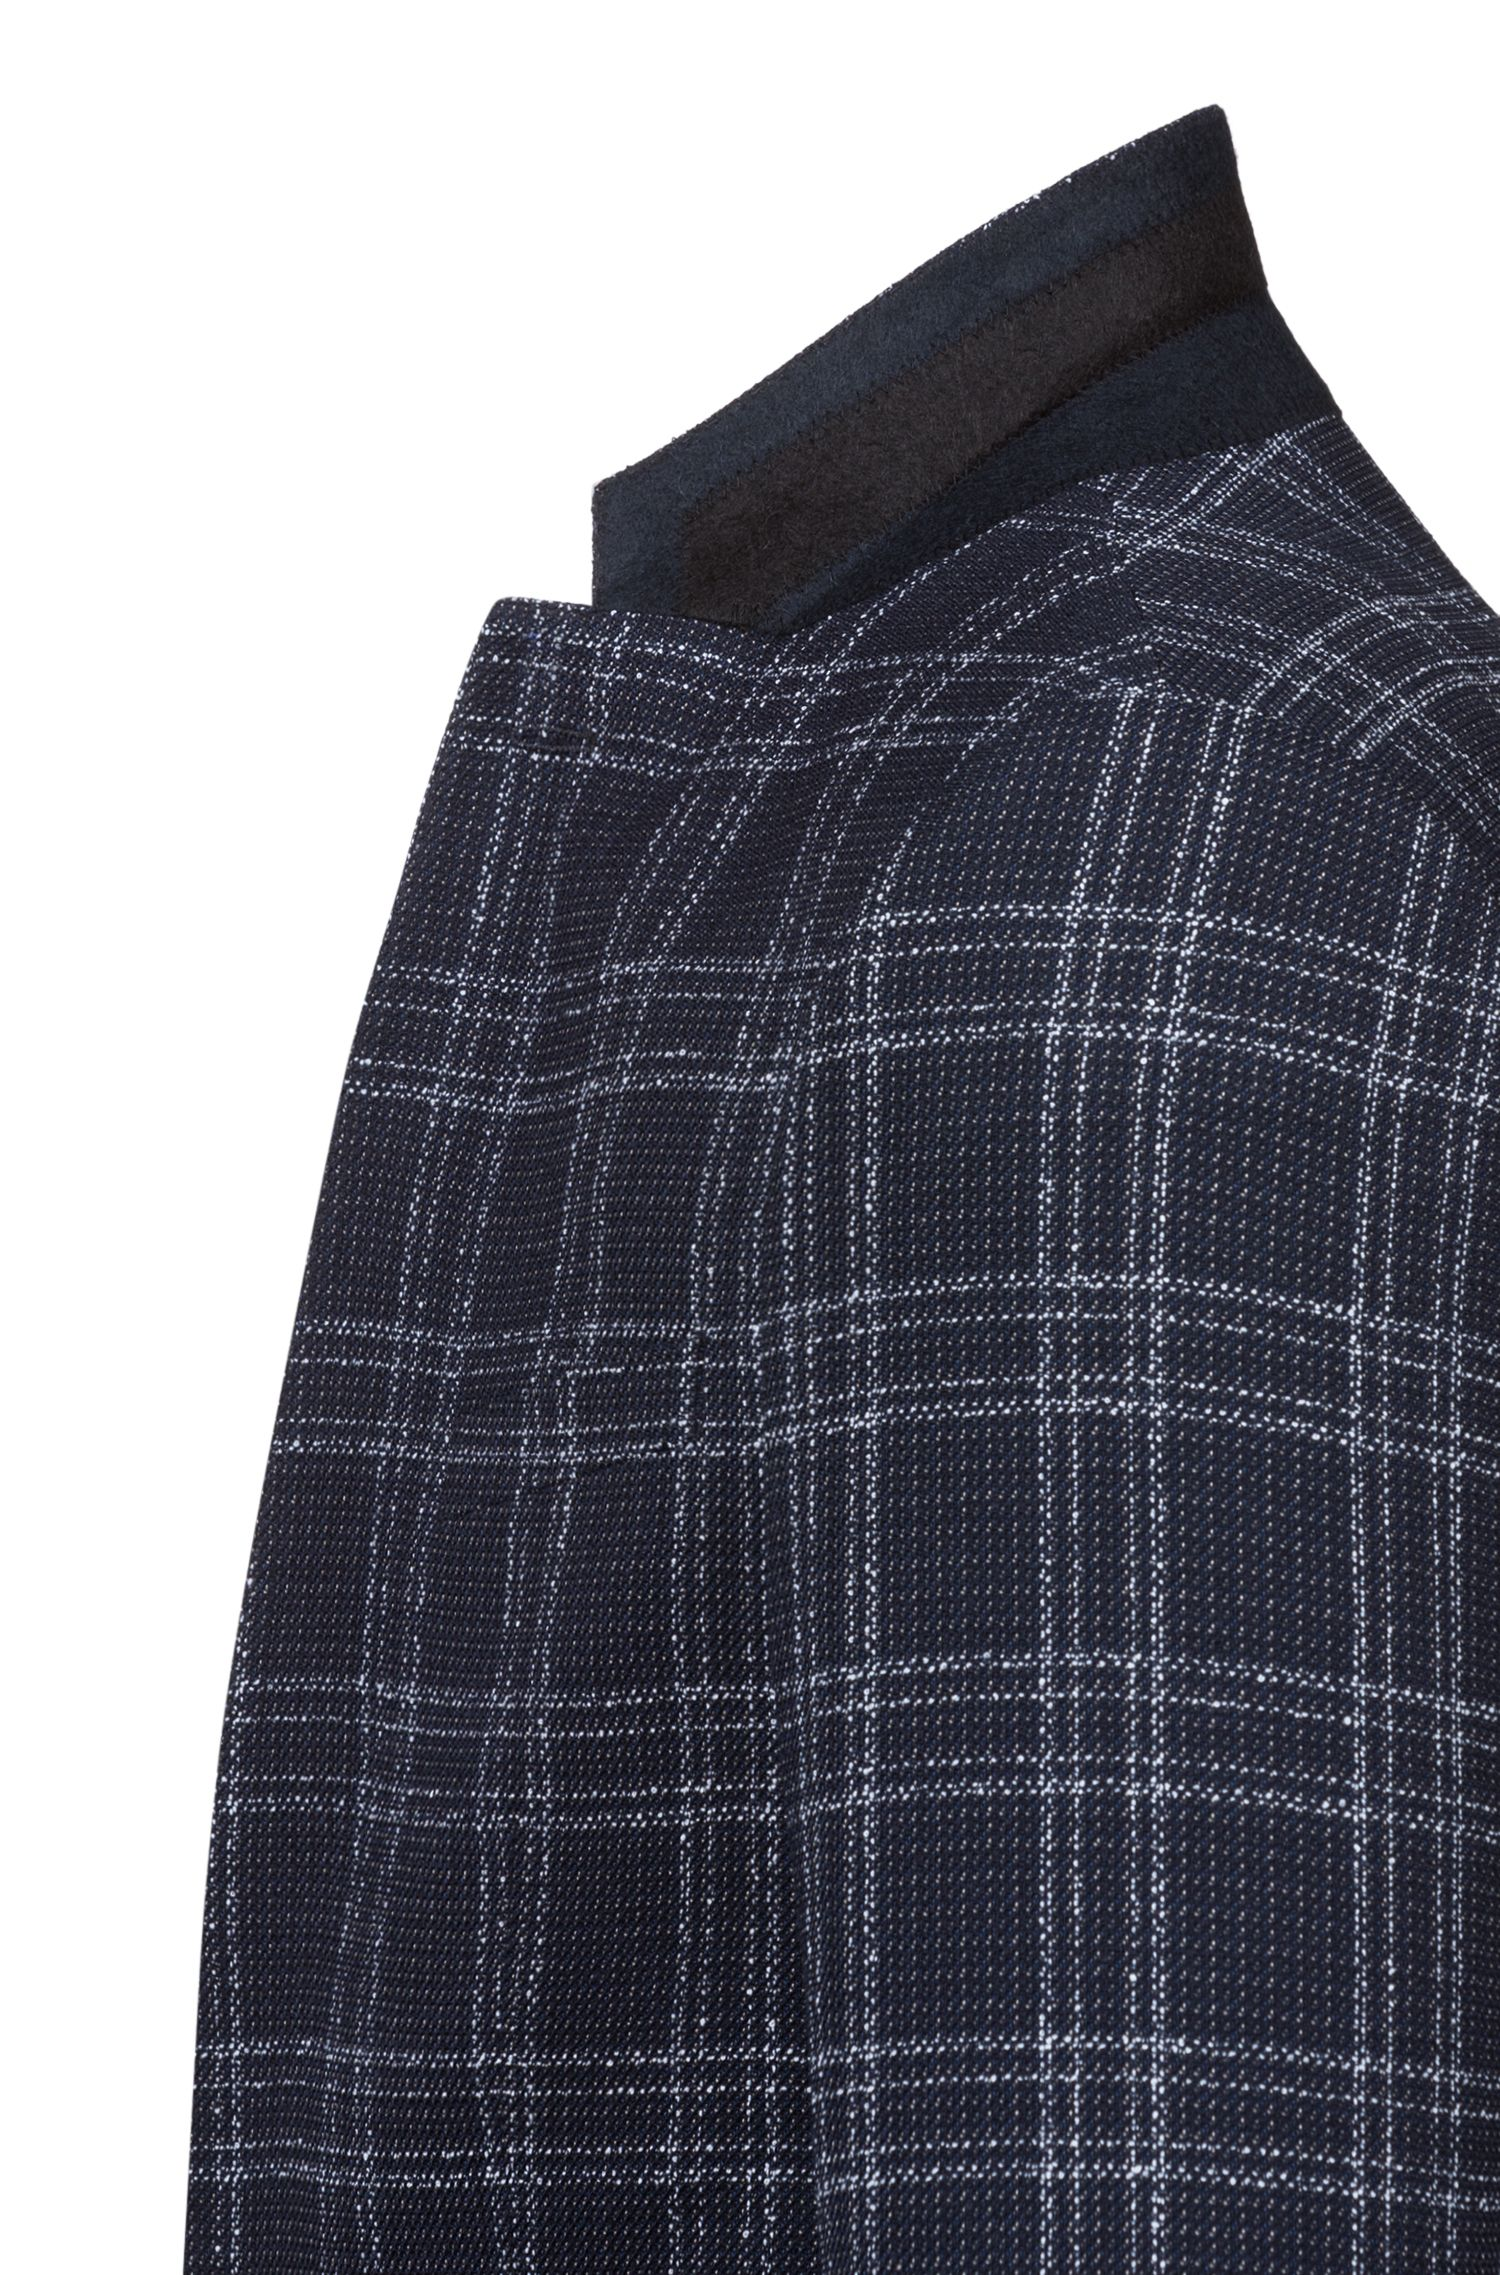 Giacca slim fit in misto lana con effetto tweed, A disegni